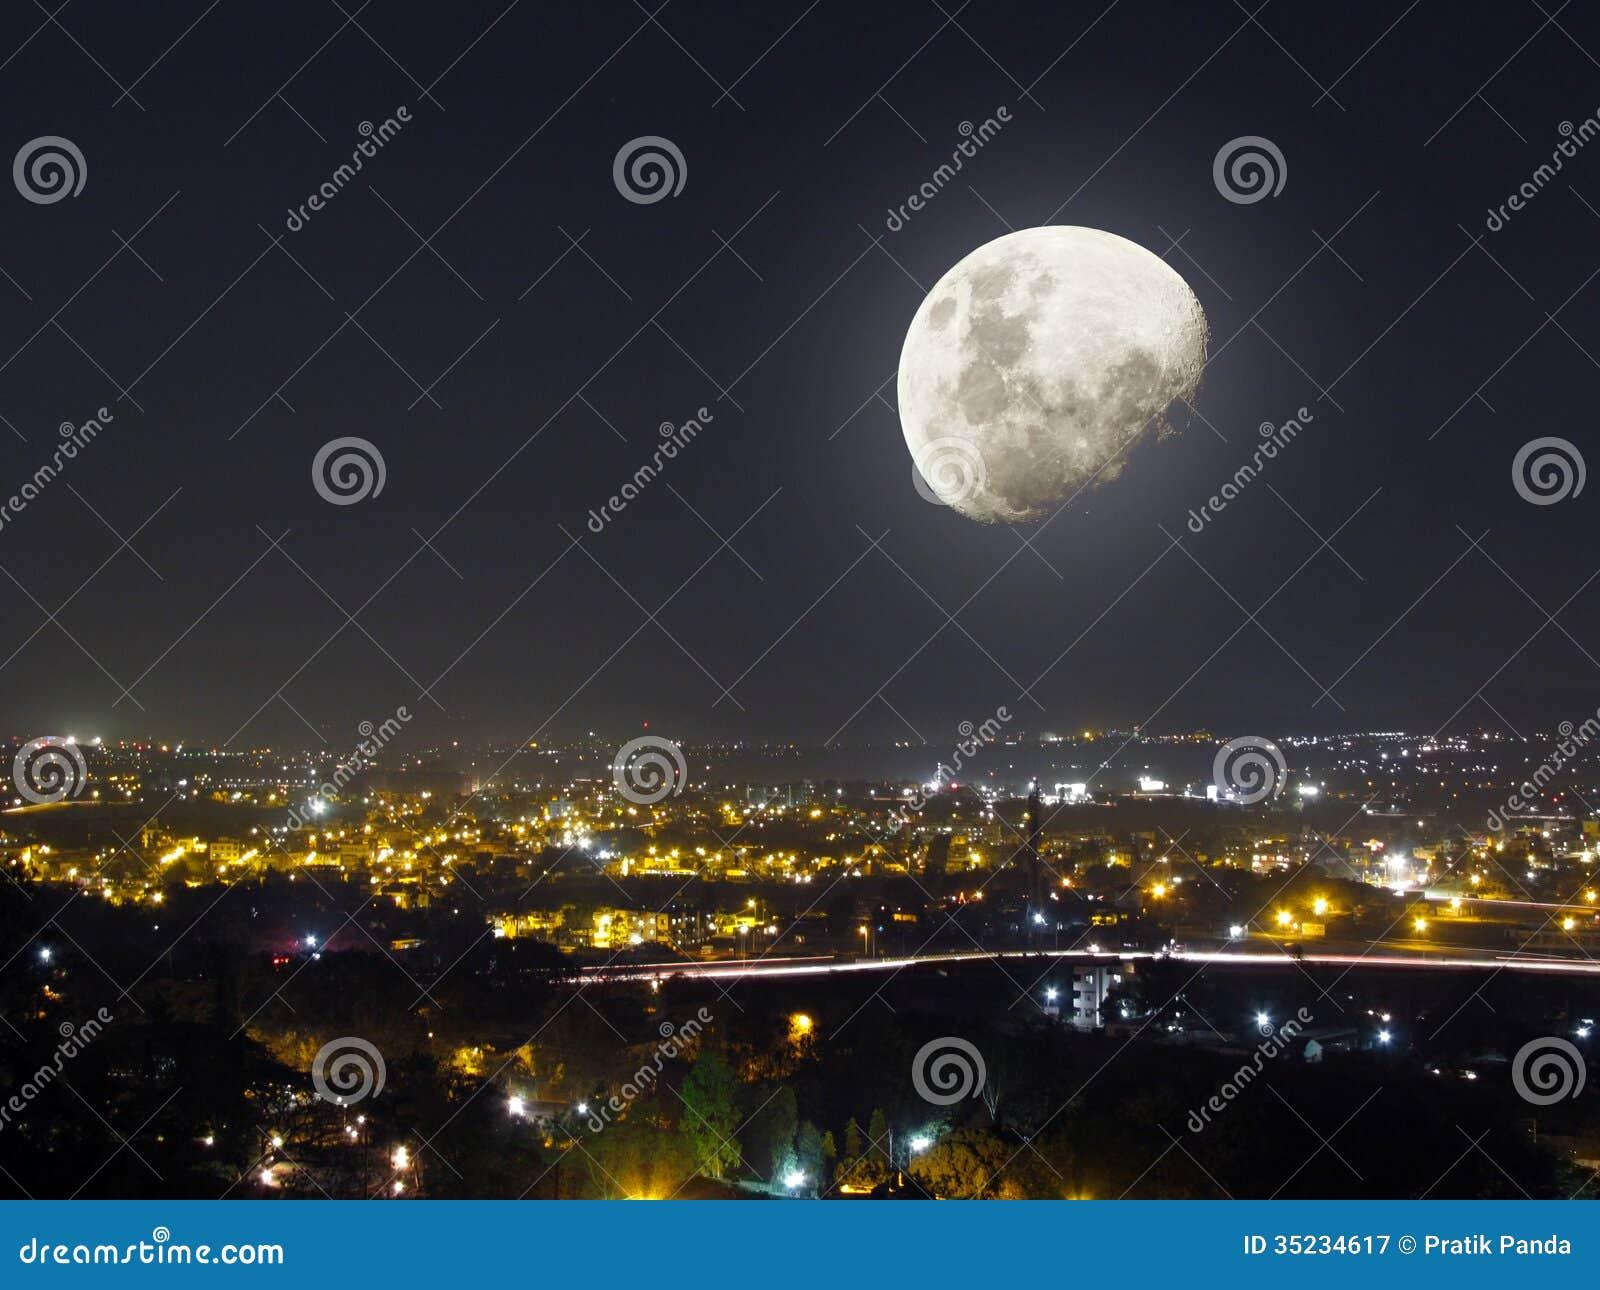 Moon light night city view